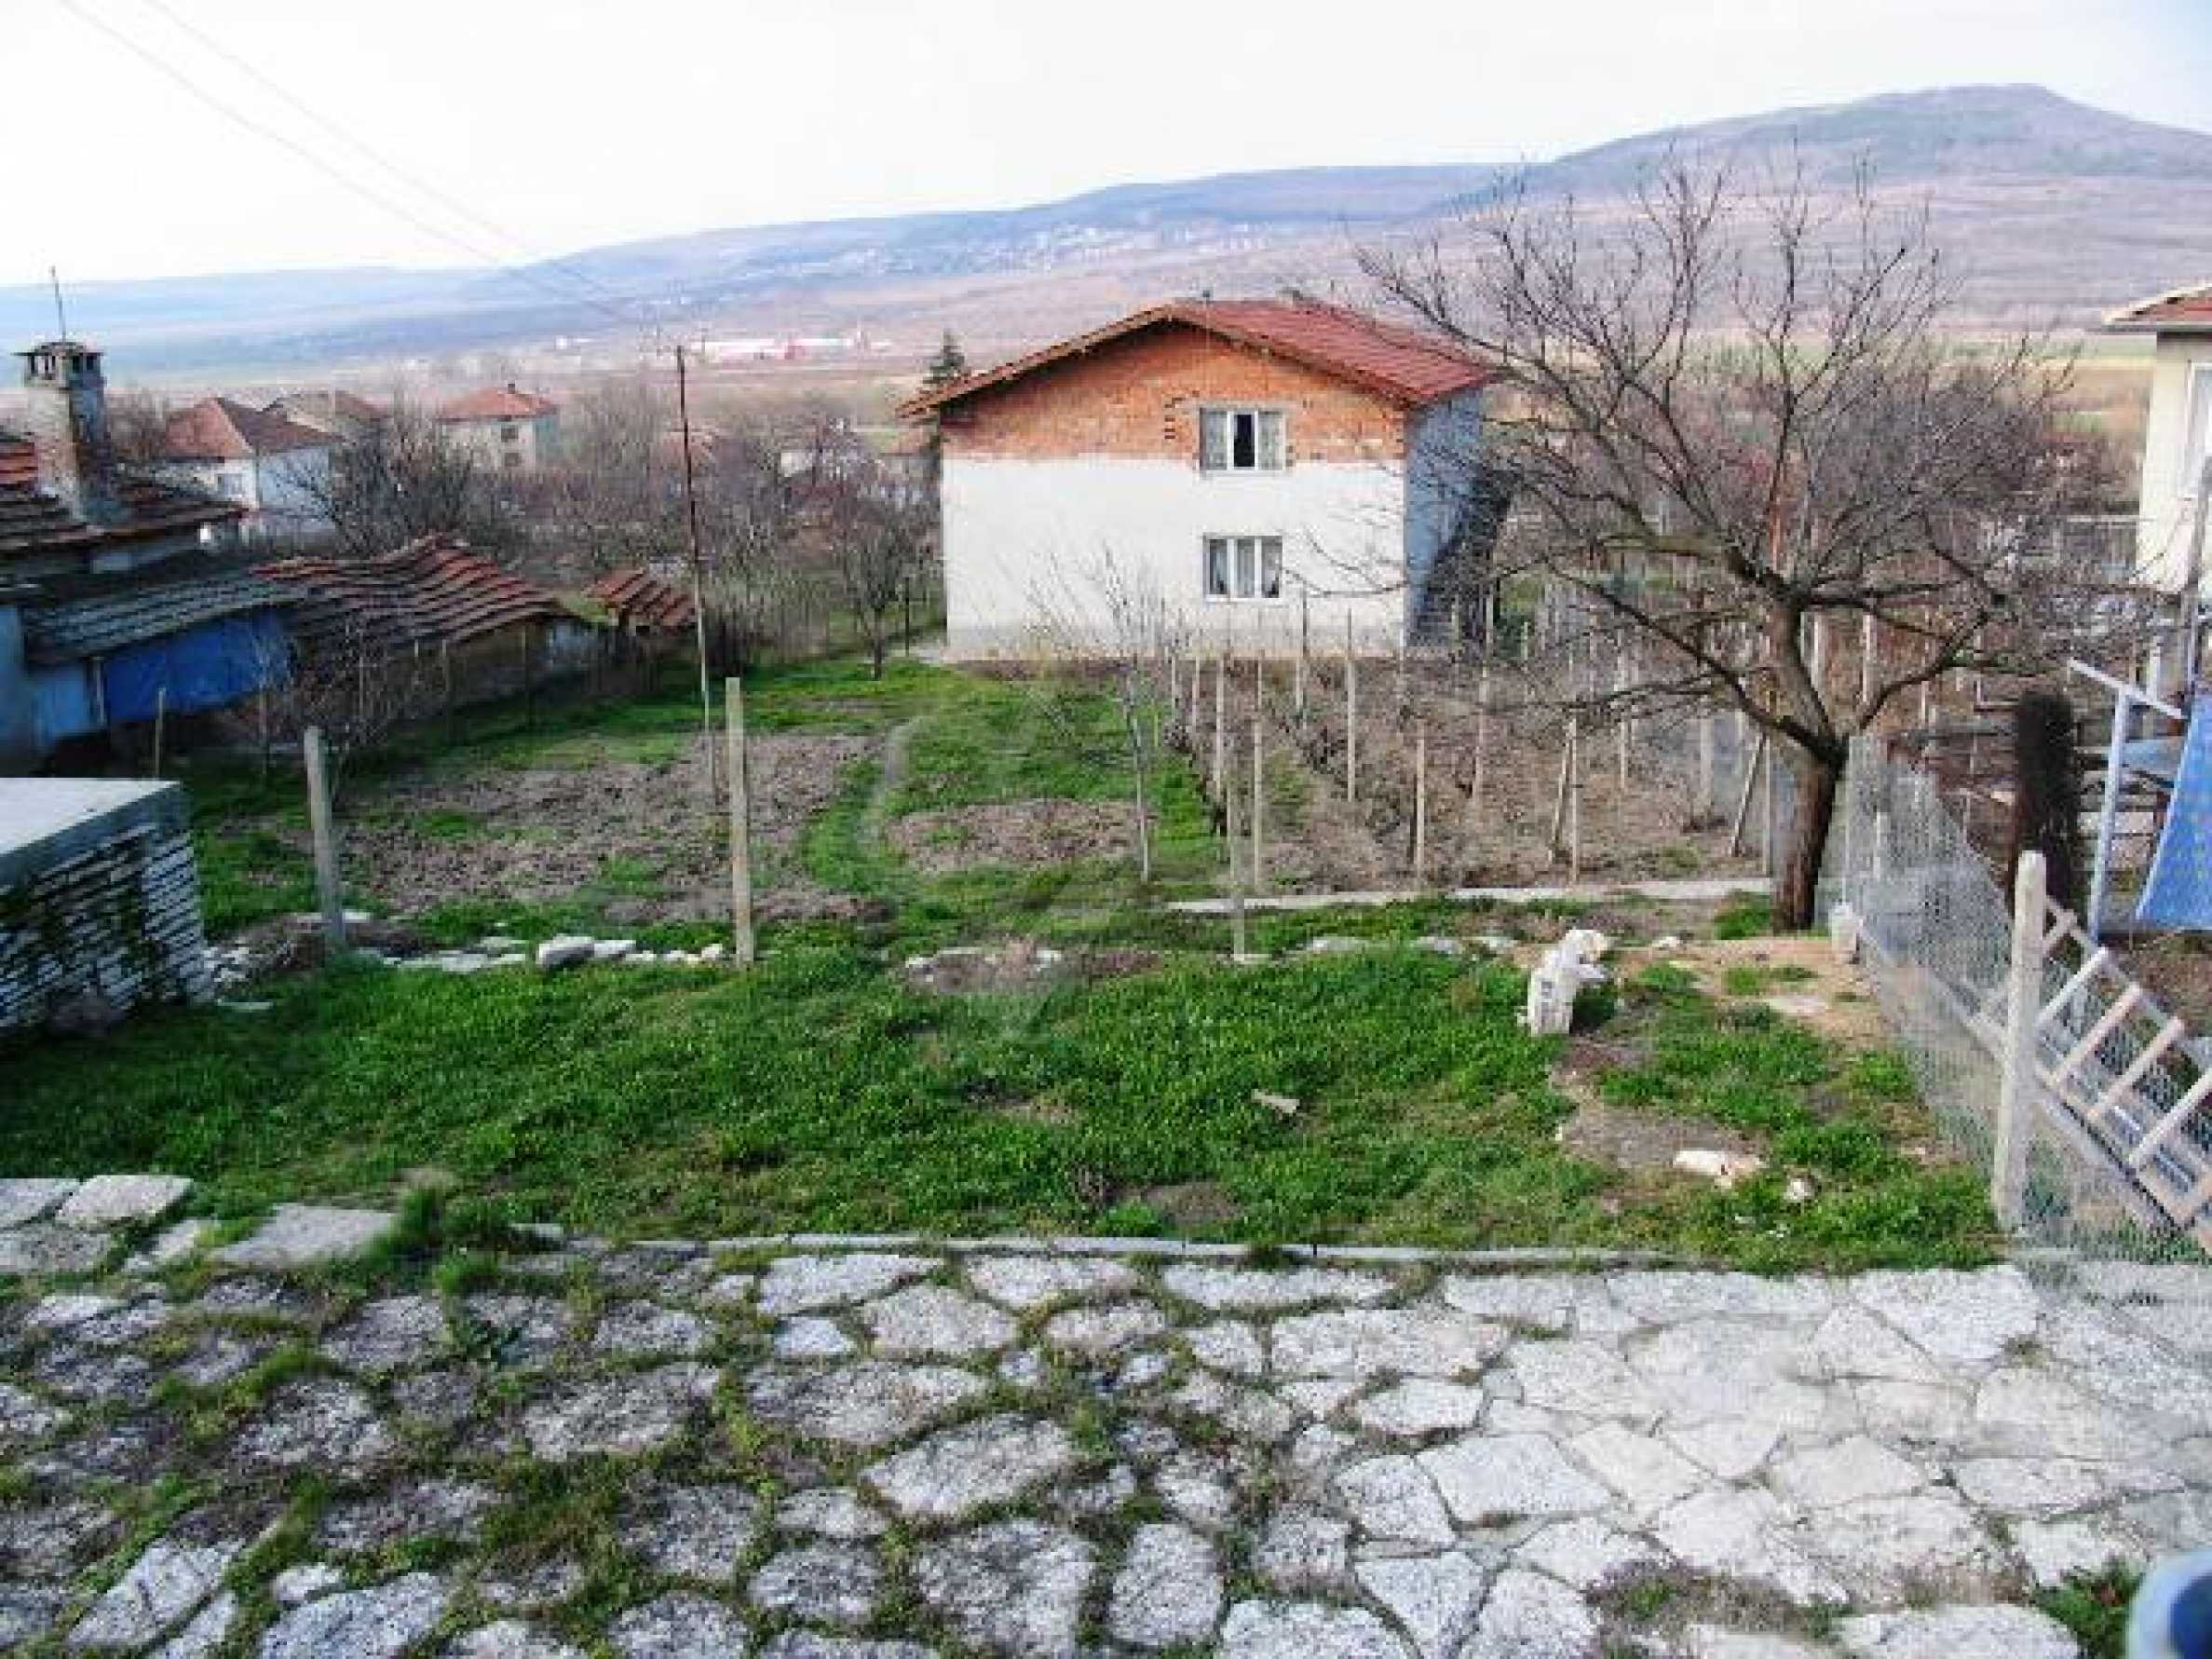 Land in Obrochishte Village, just 3km from Albena Resort